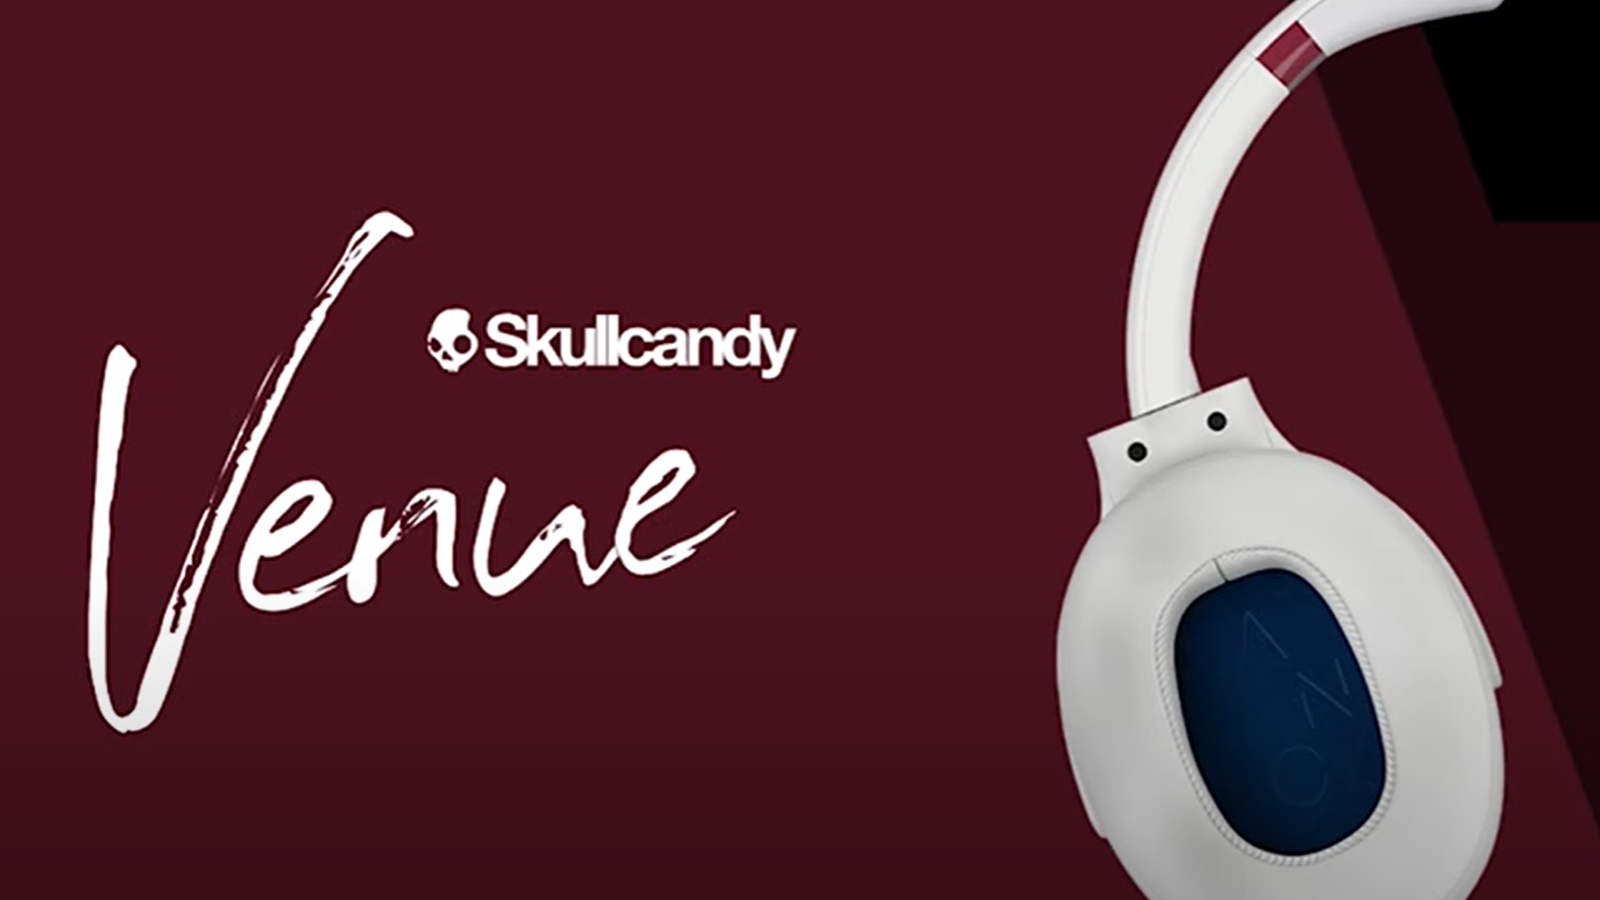 Skullcandy Venue headphones against a red background